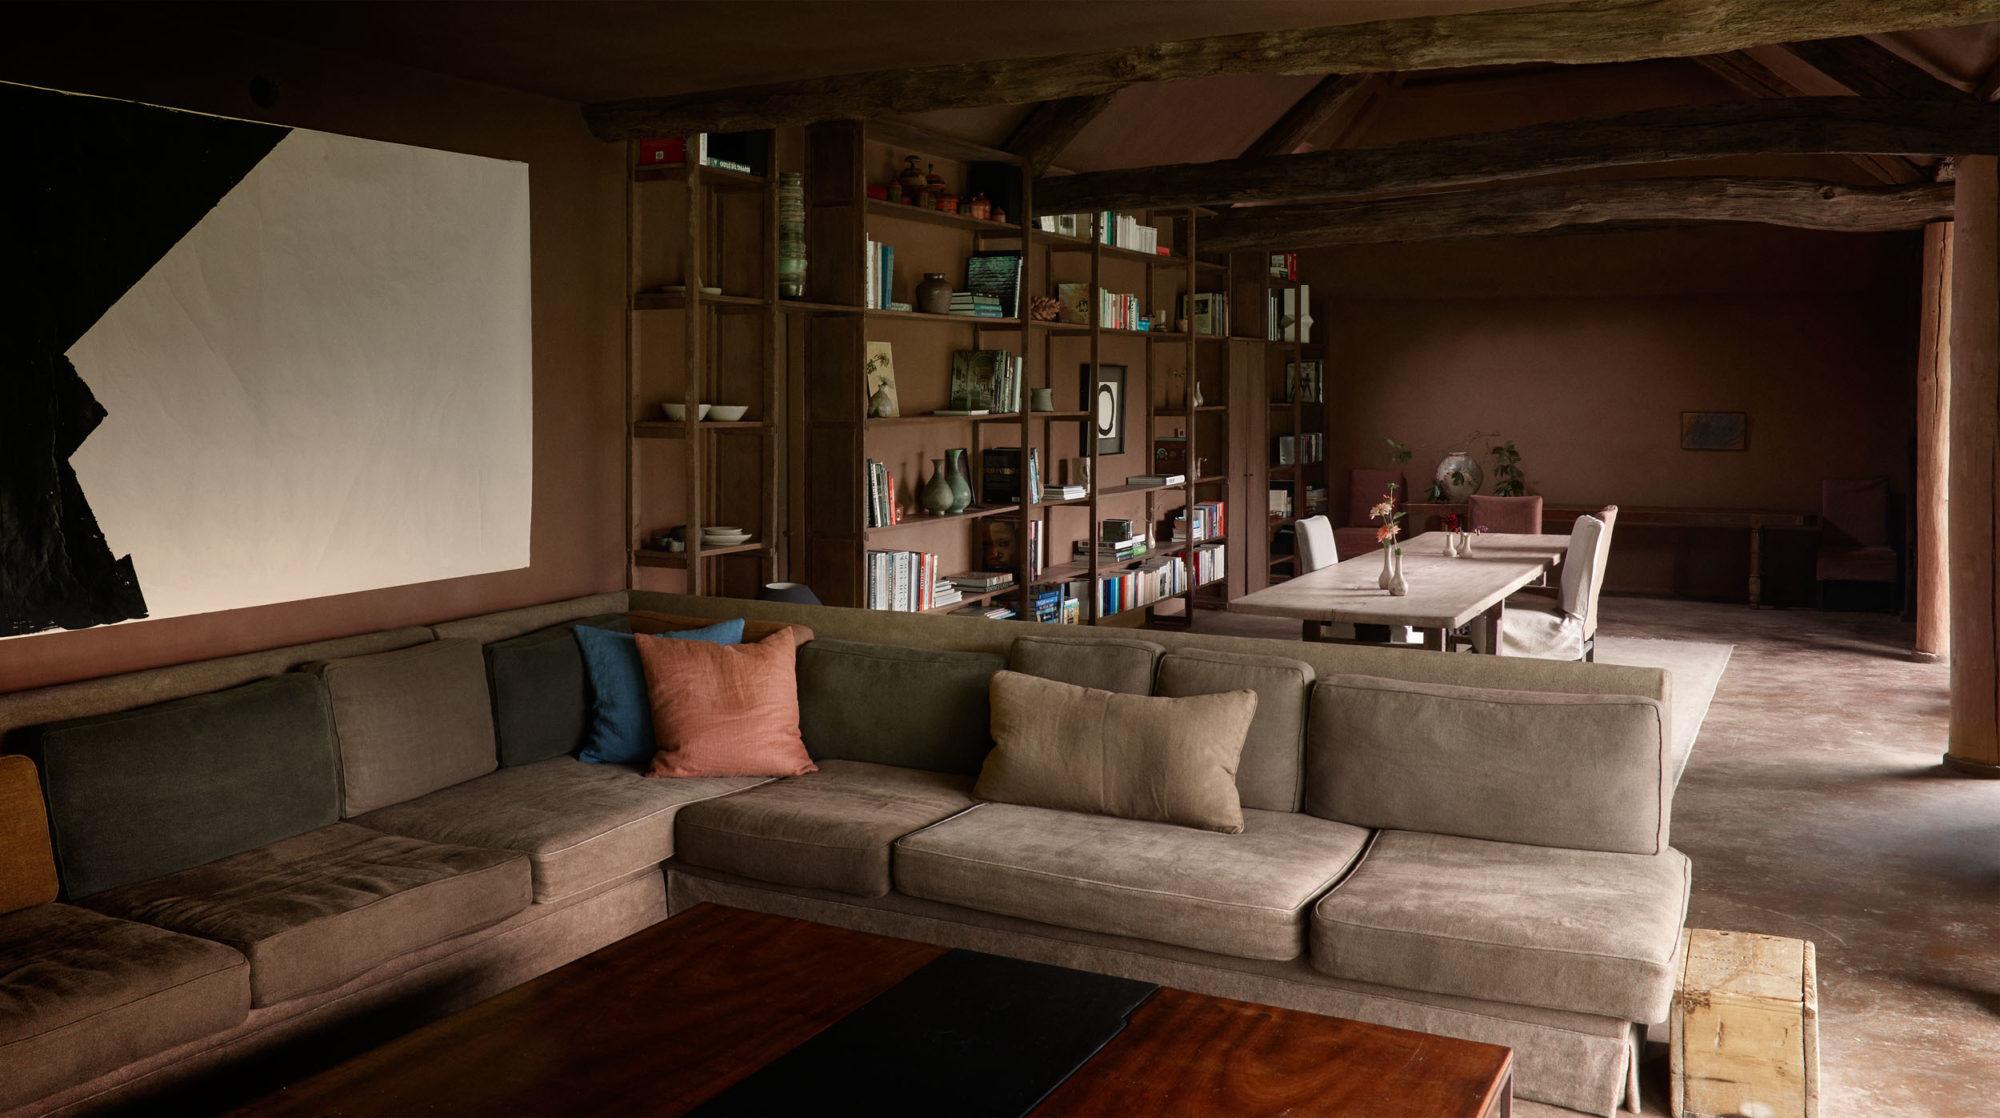 Wabi sitting room